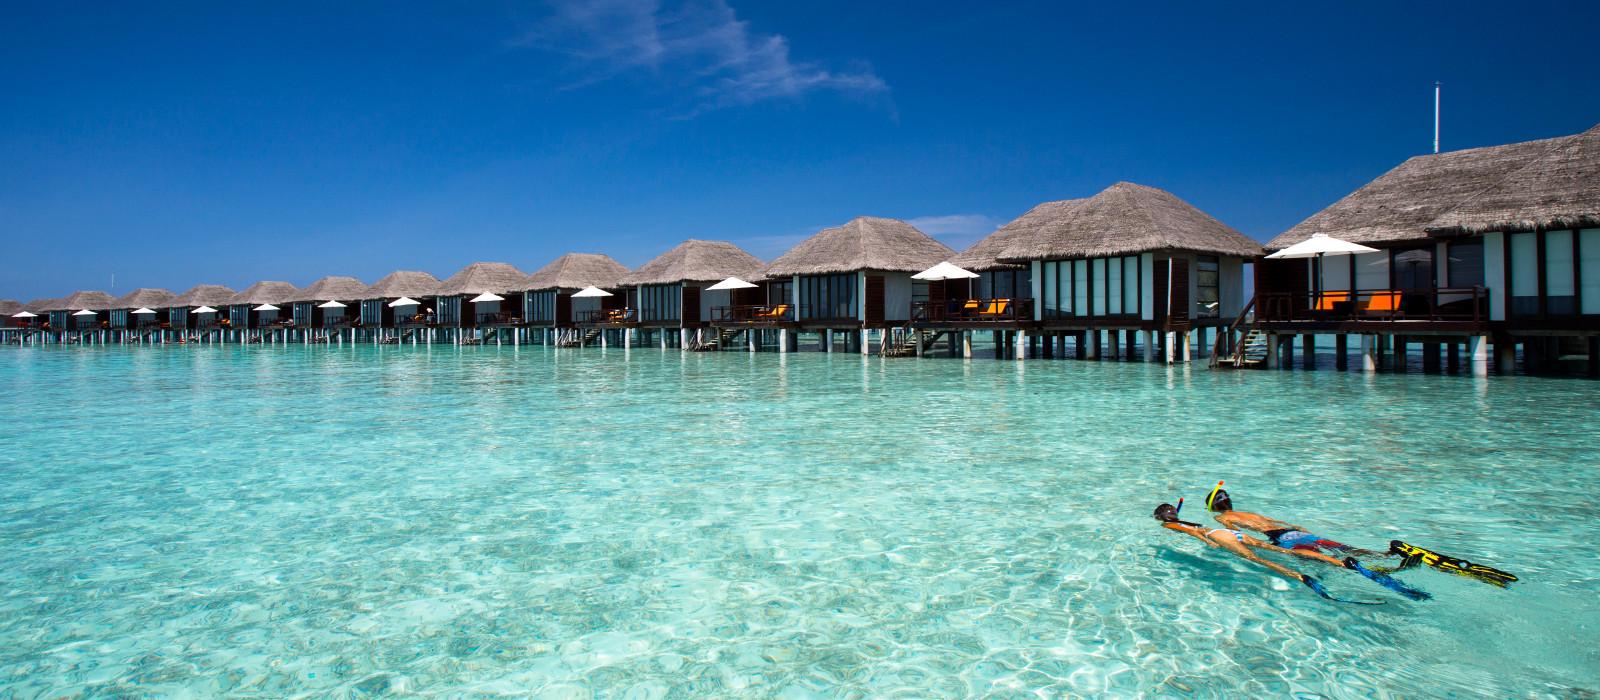 Ocean view at Velassaru Maldives in Male, Maldives